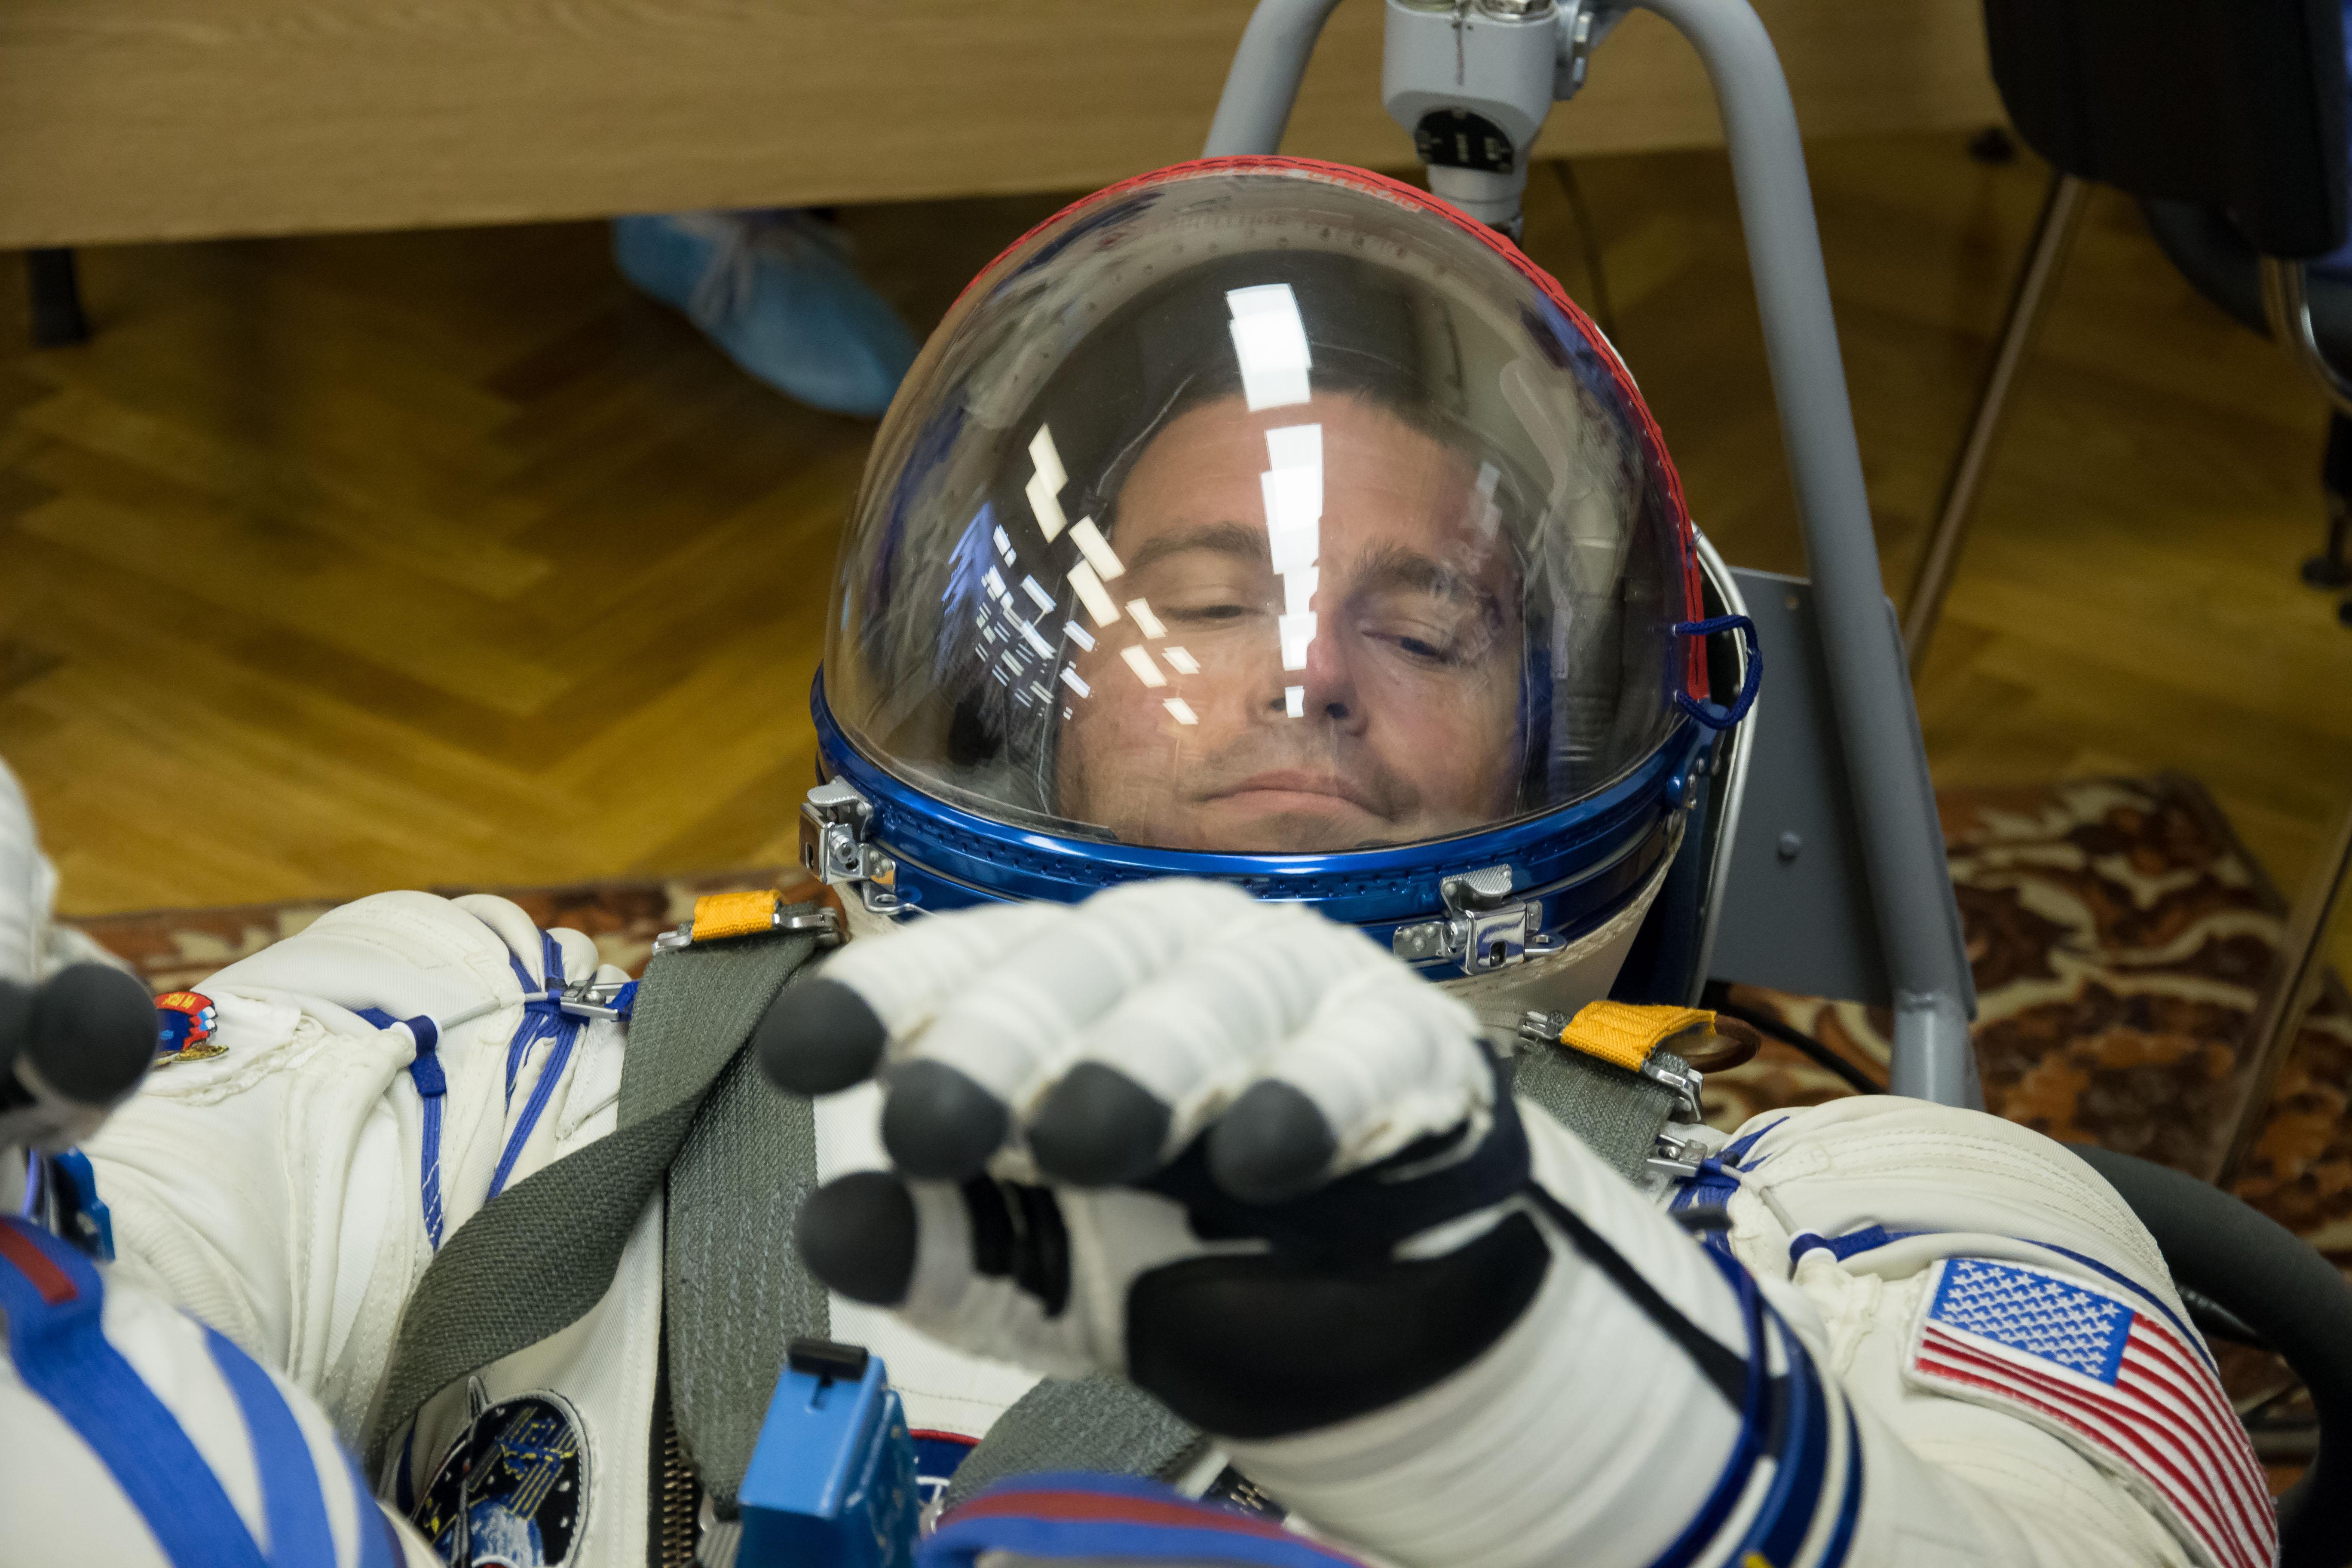 Astronaut Reid Wiseman Suits Up for Tests | NASA